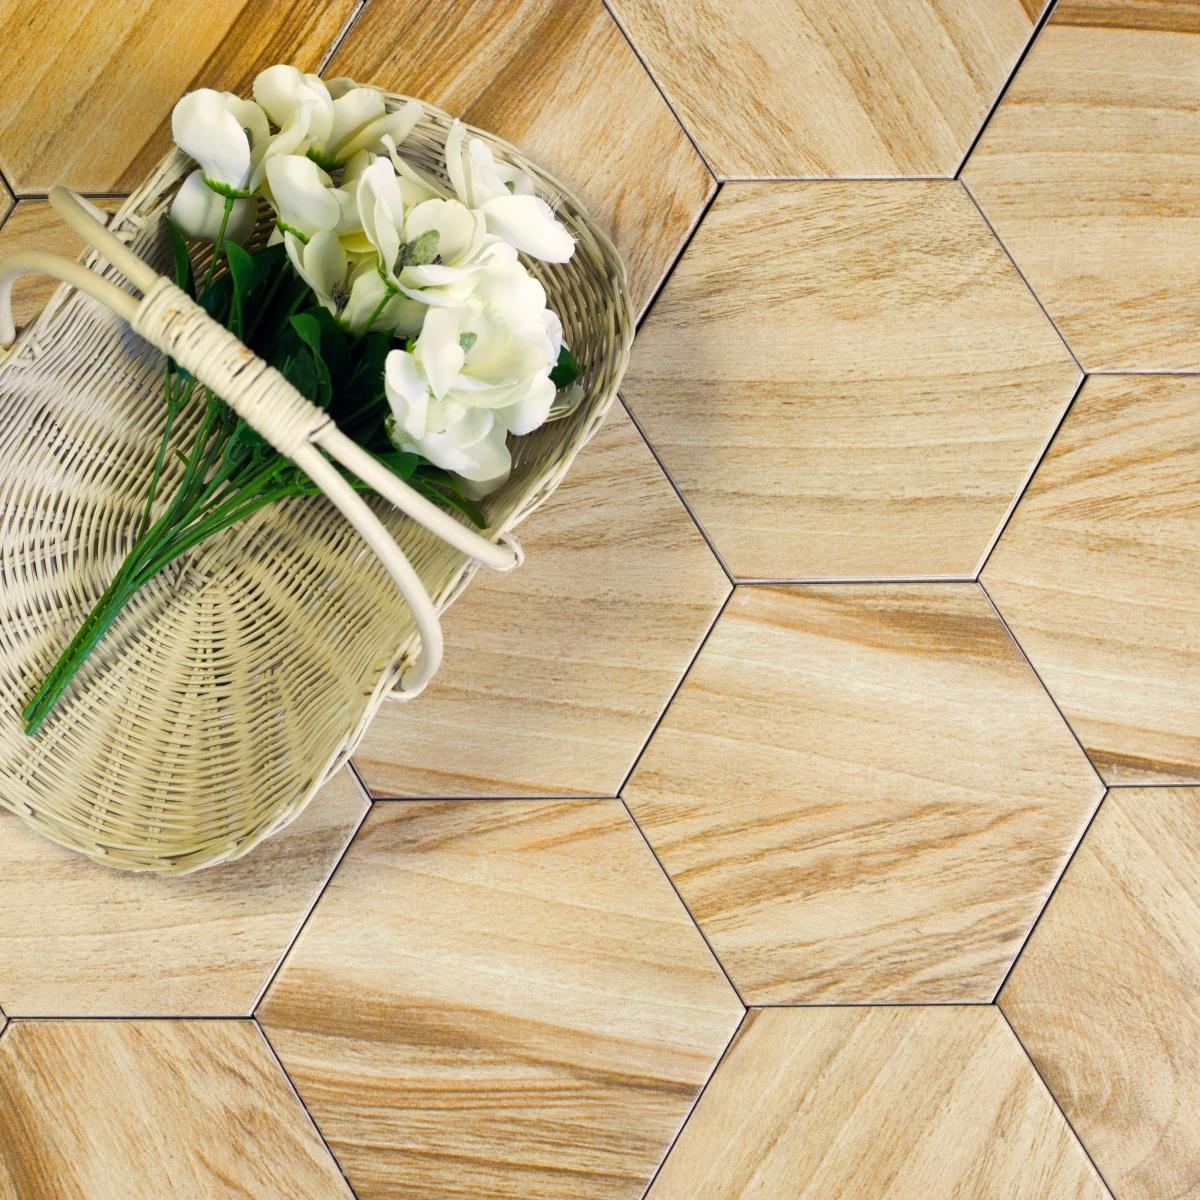 Artisan wood 8 x 8 ceramic hexagon wood look tile in fresh pine dailygadgetfo Choice Image